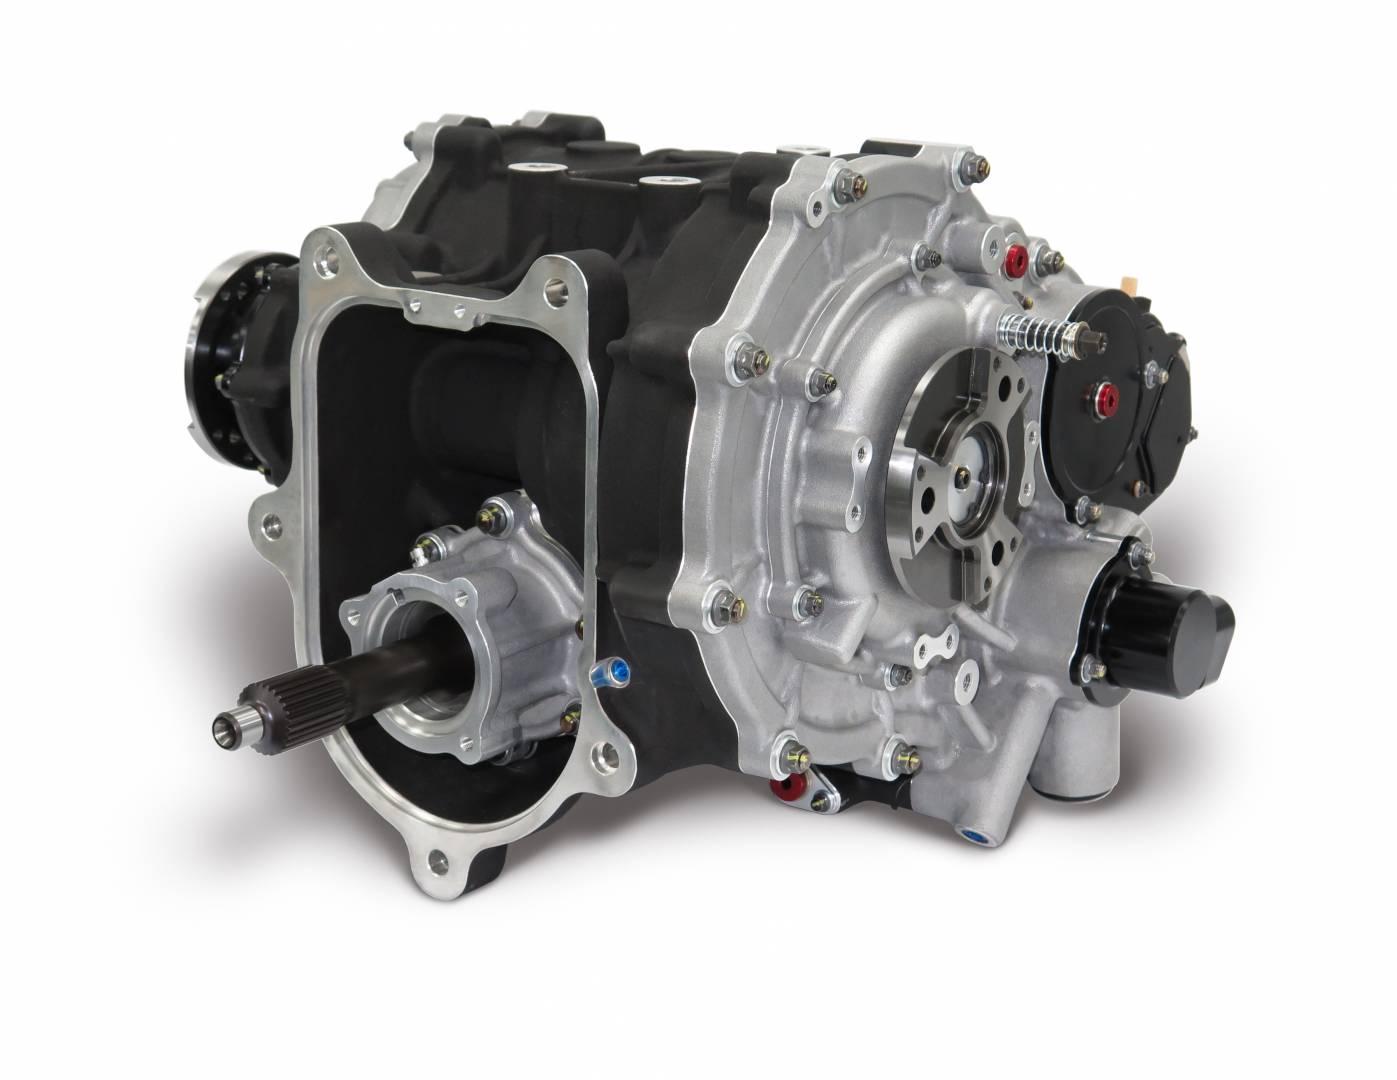 Xrtac's latest GT3 gearbox.